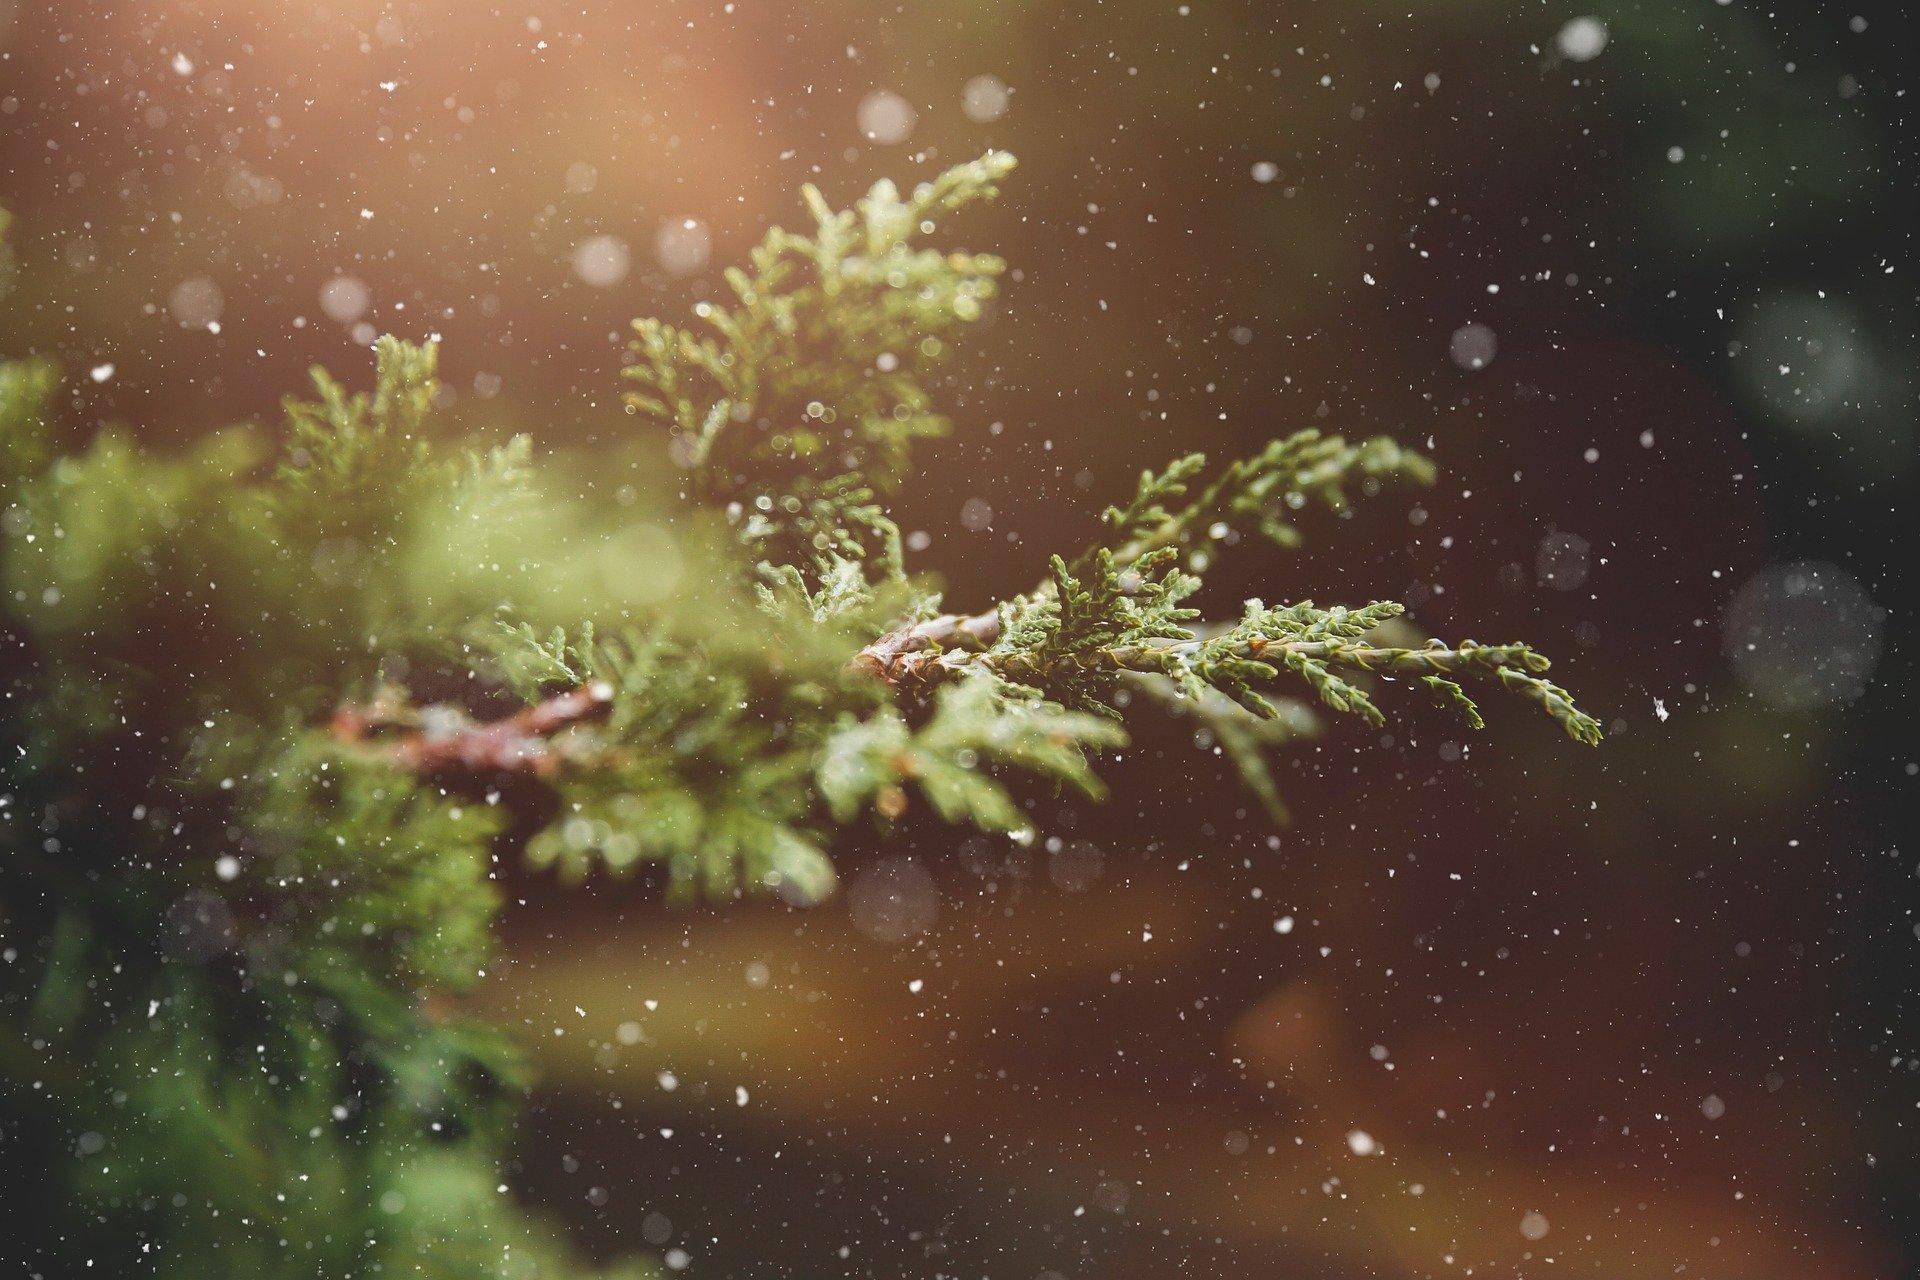 Christmas tree Image by Pezibear from Pixabay